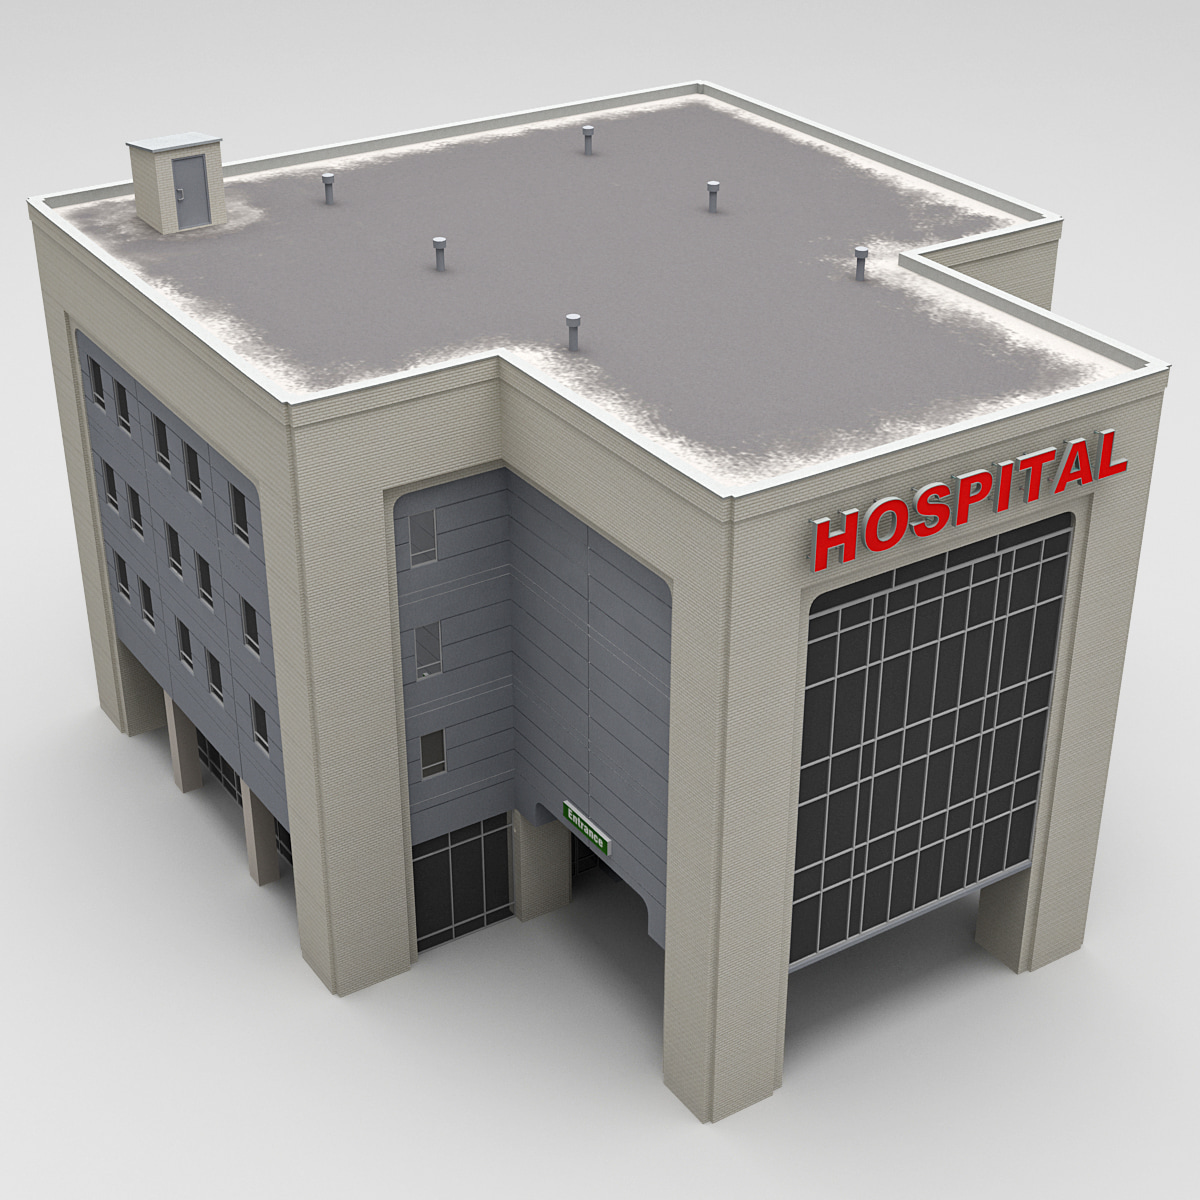 Hospital_Building_0001.jpg